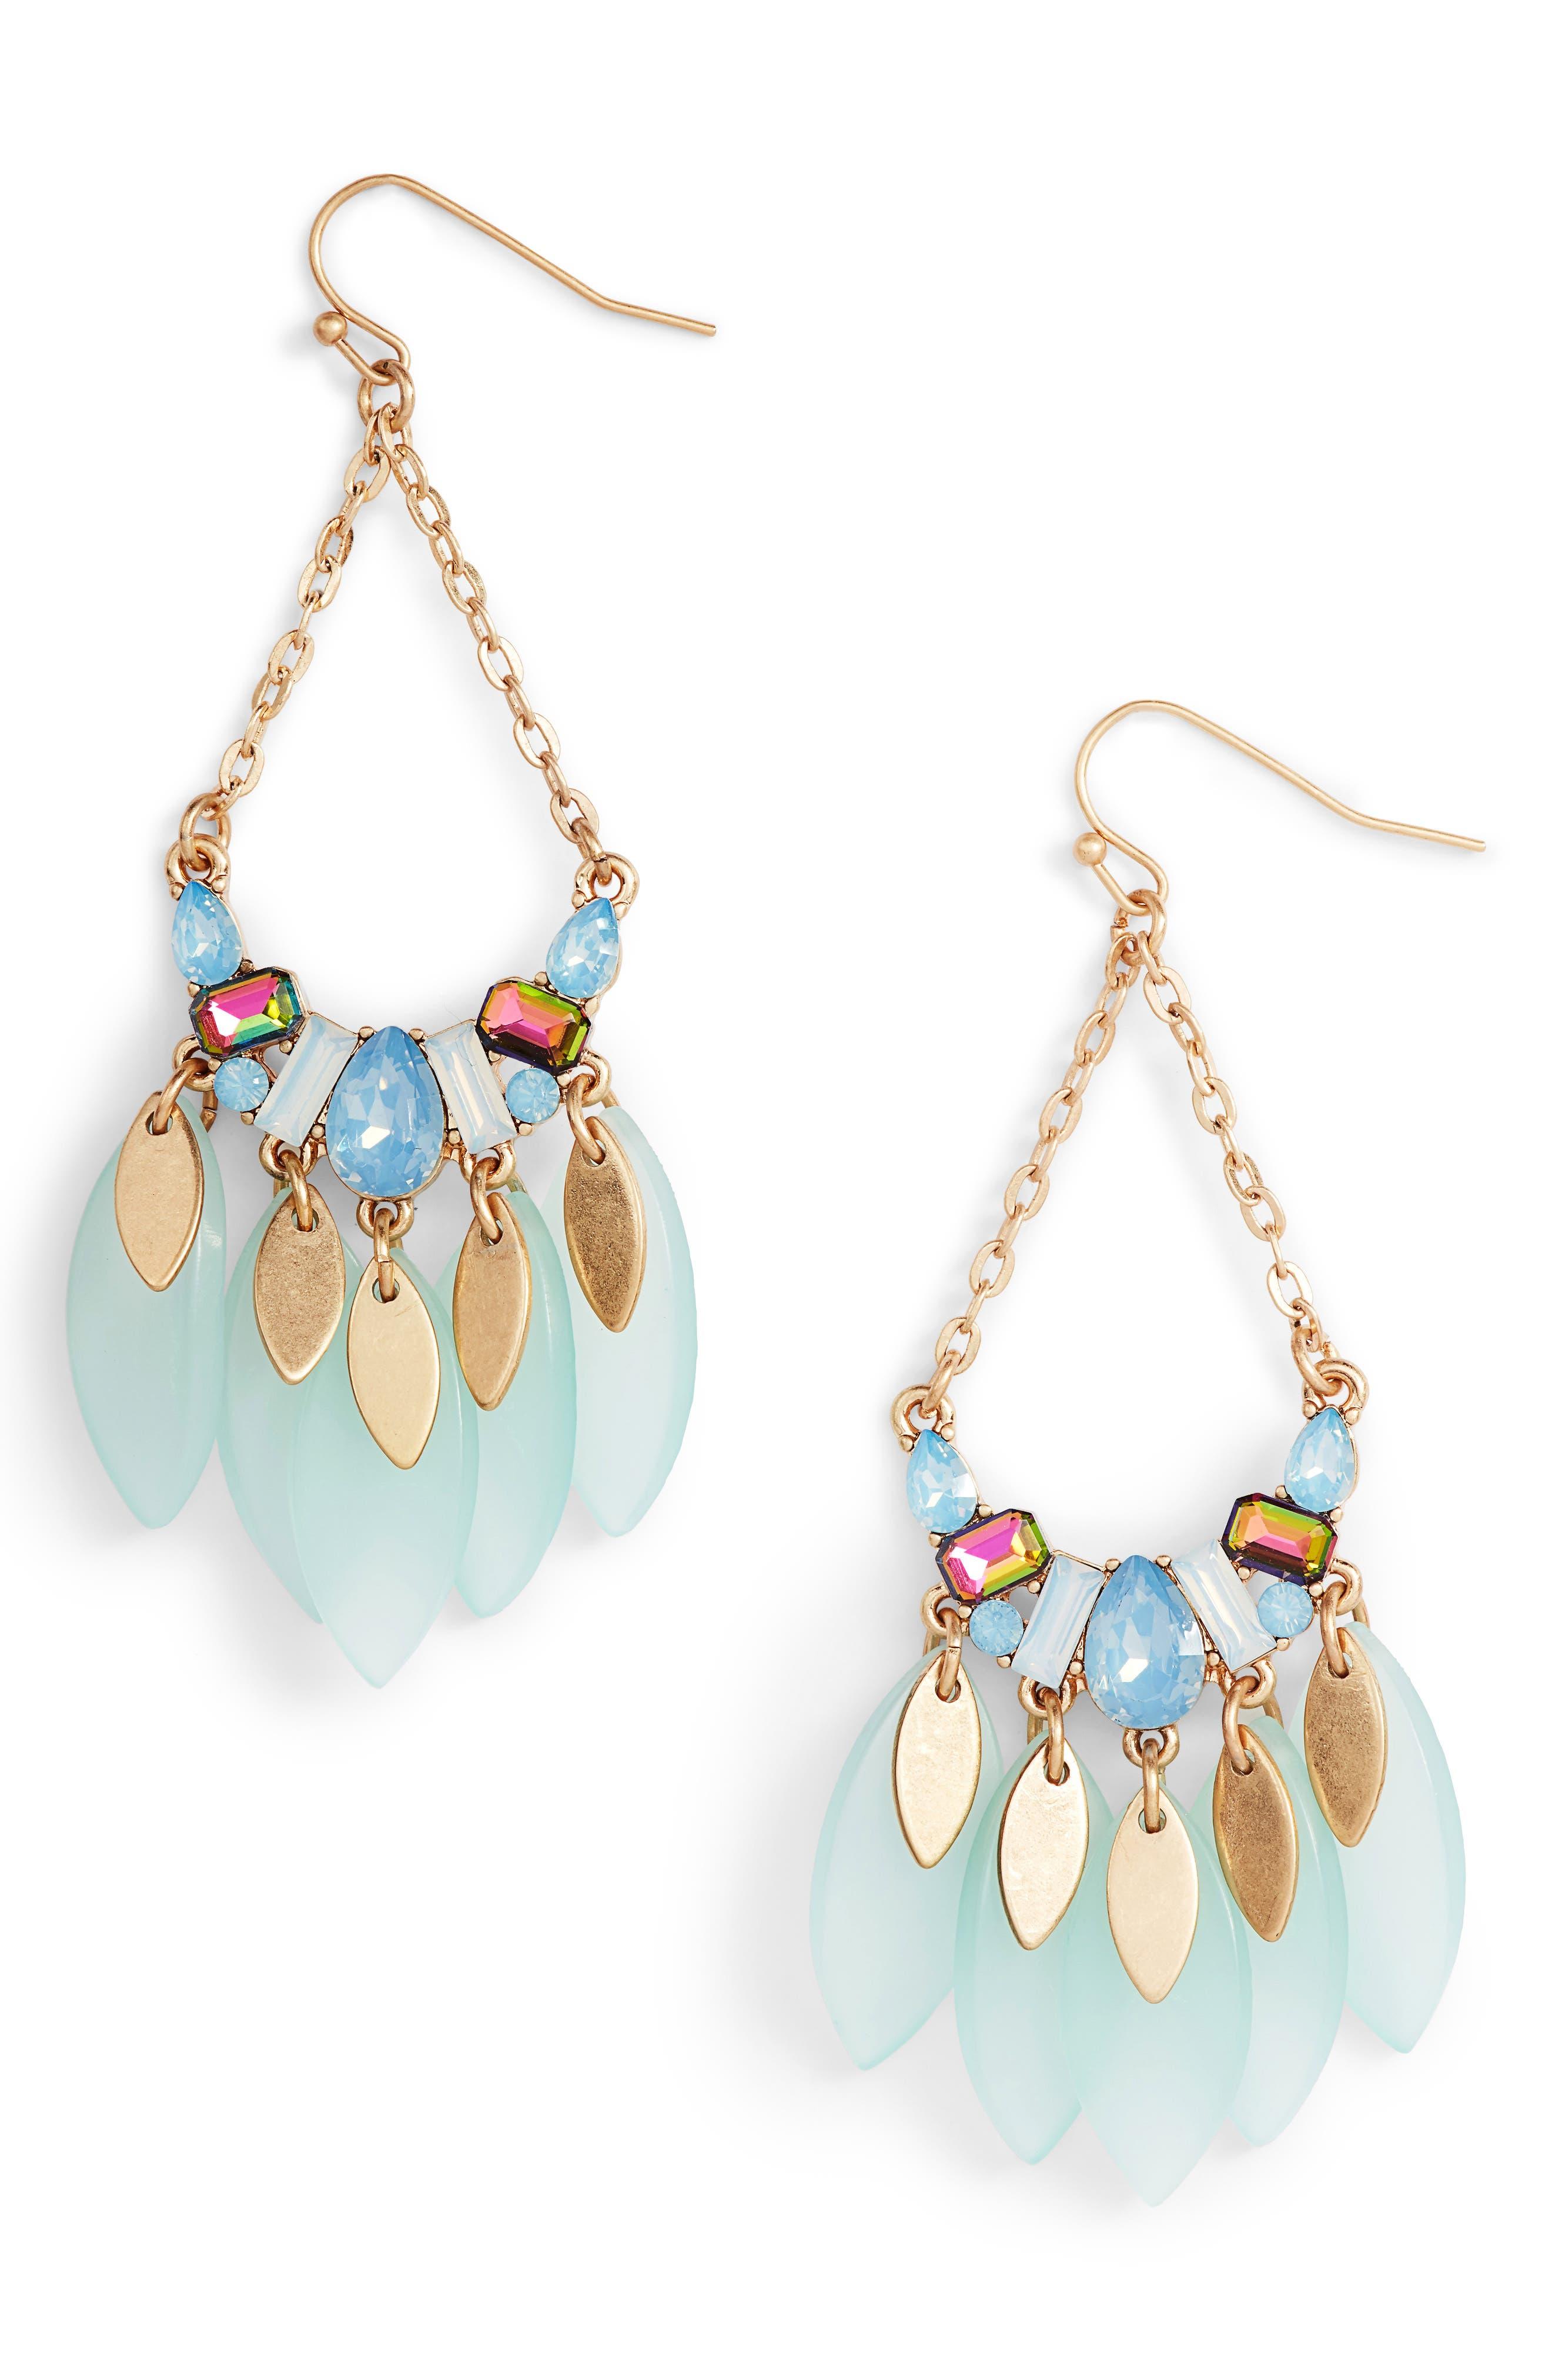 Petal Teardrop Earrings,                             Main thumbnail 1, color,                             Blue Opal- Gold